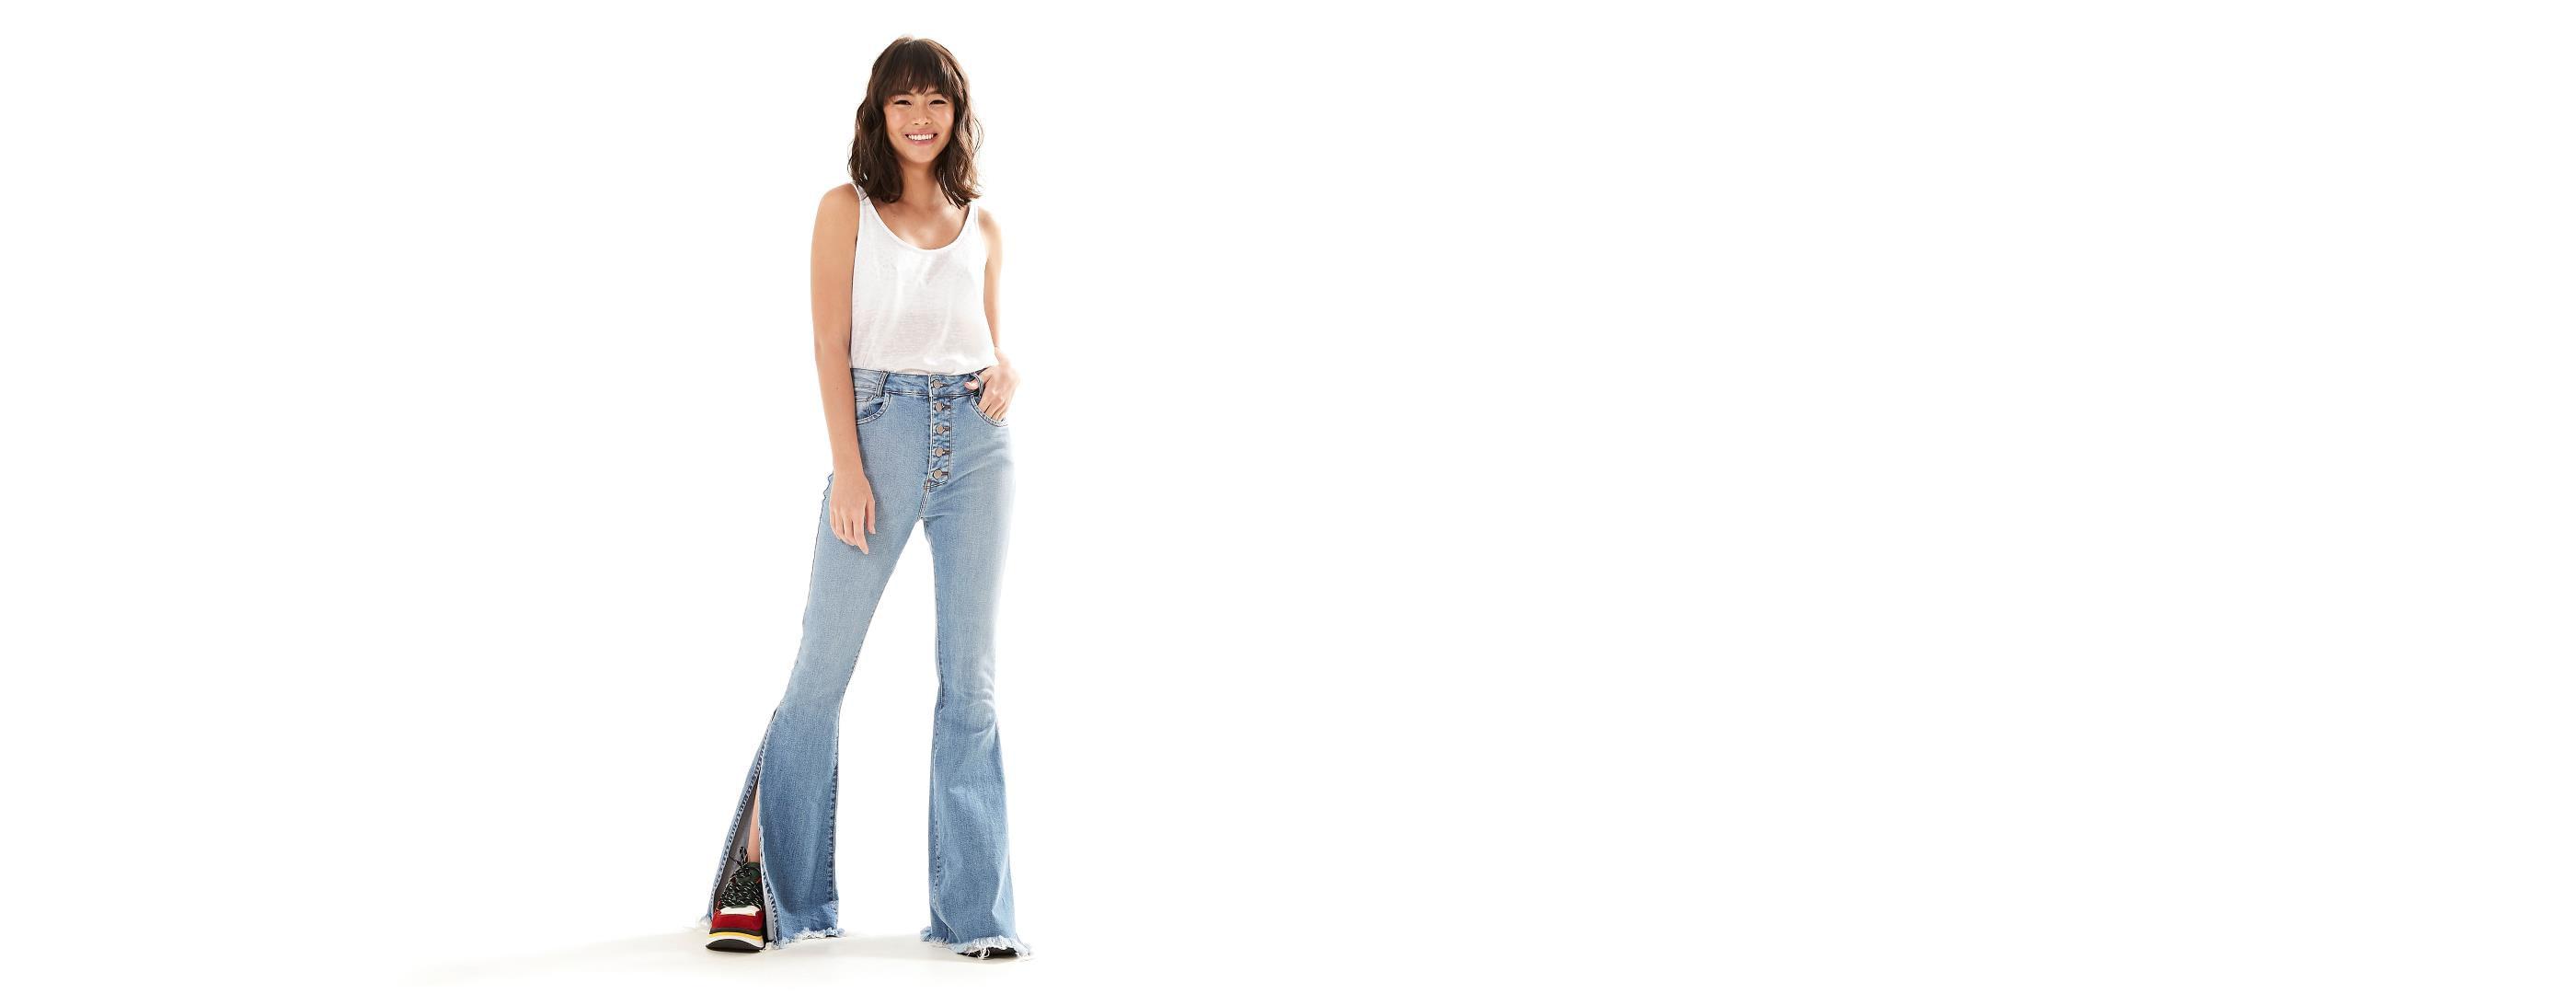 69ee531d2 Farm · Moda Feminina · Calça. Flare Jeans Maxi Fenda